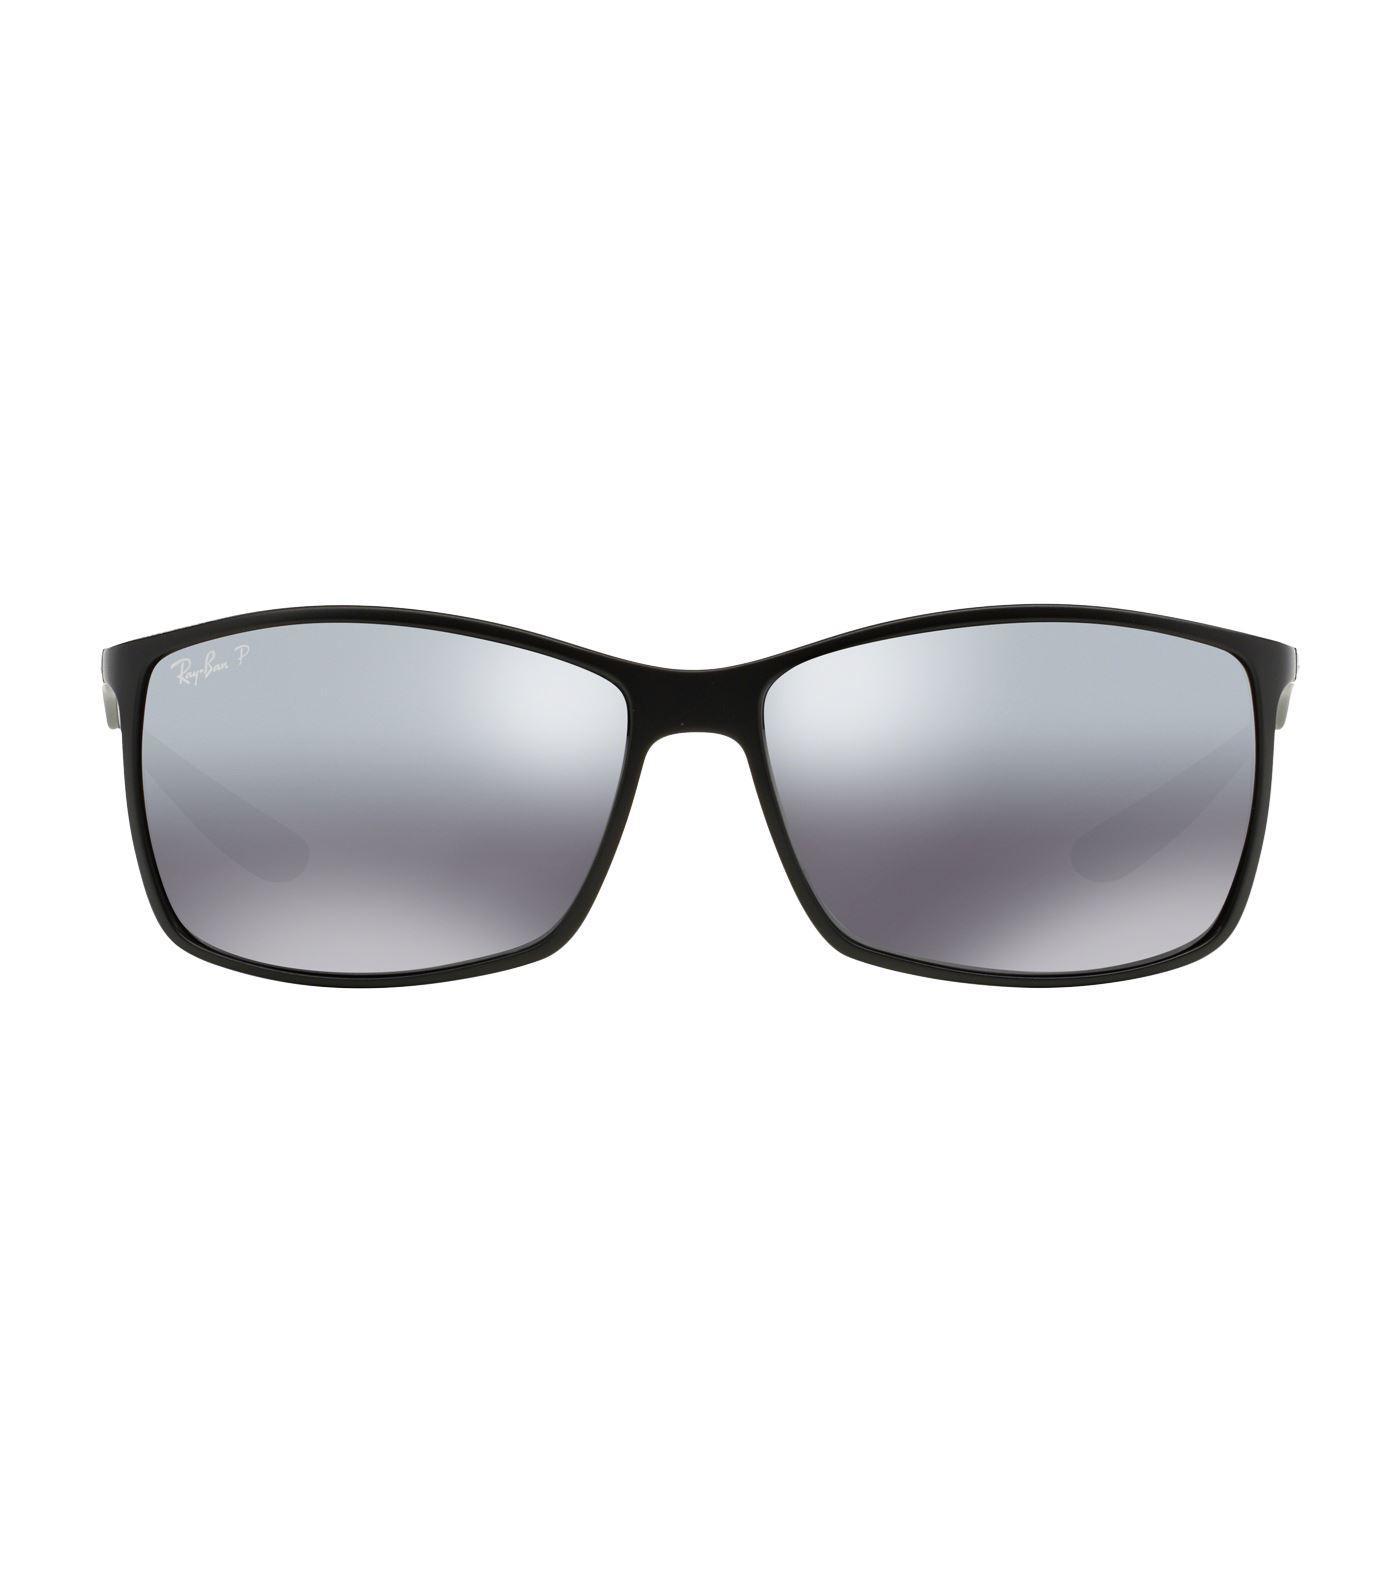 062e9fe837c5b Ray Ban Ray-Ban Man Rb4179 - Frame Color  Black